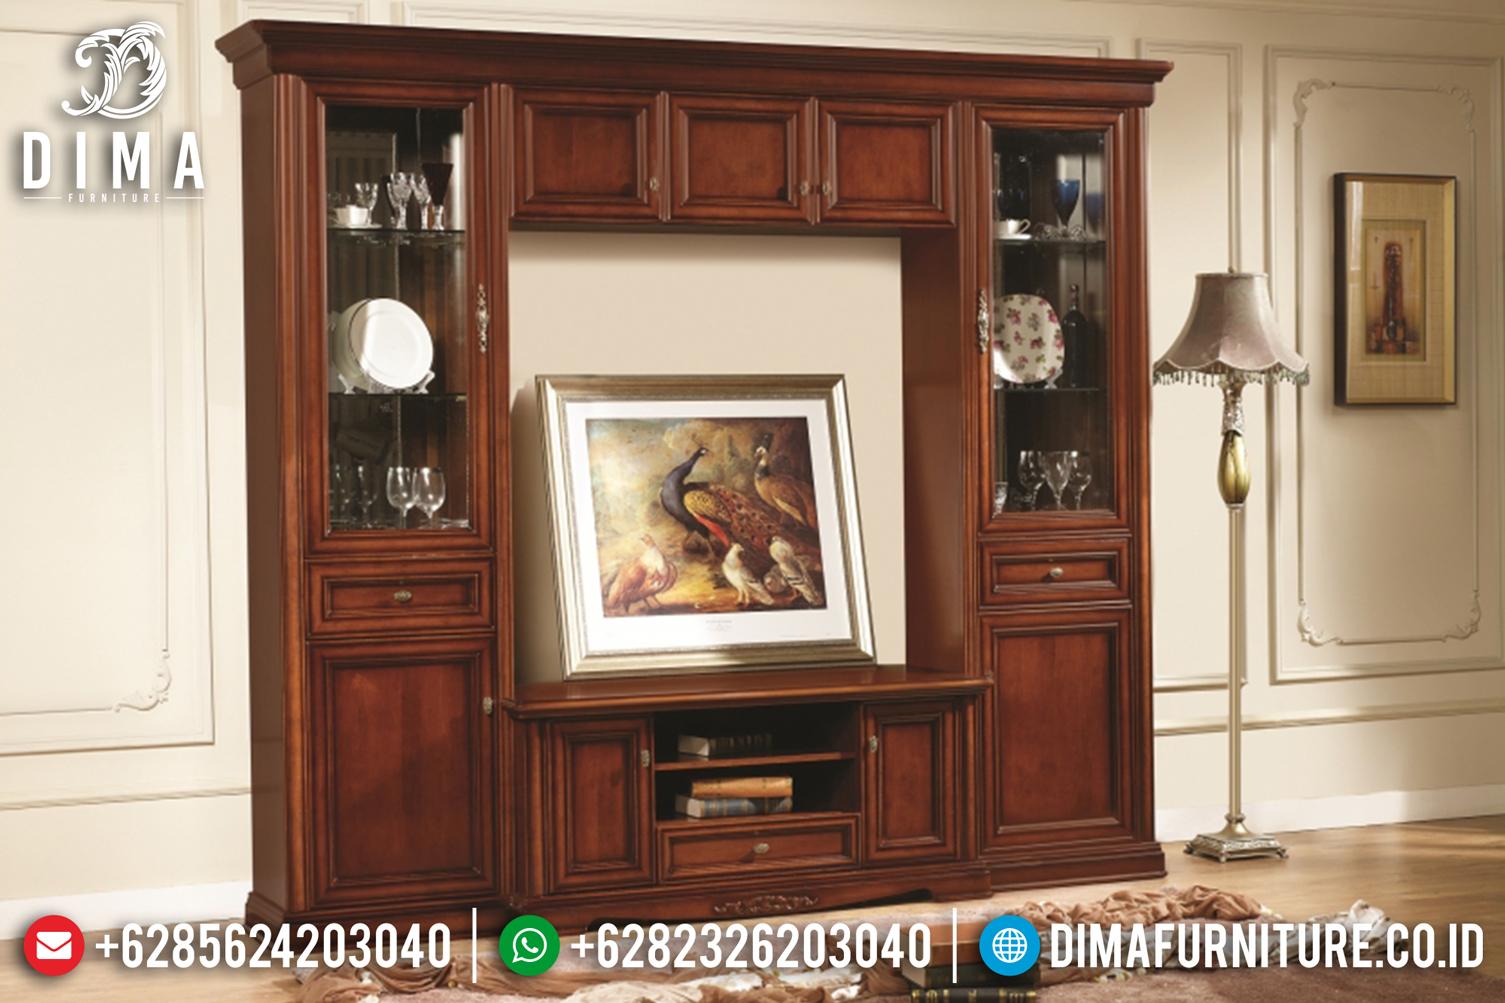 Lemari Hias Bufet TV Jati Jepara Minimalis BT-0113